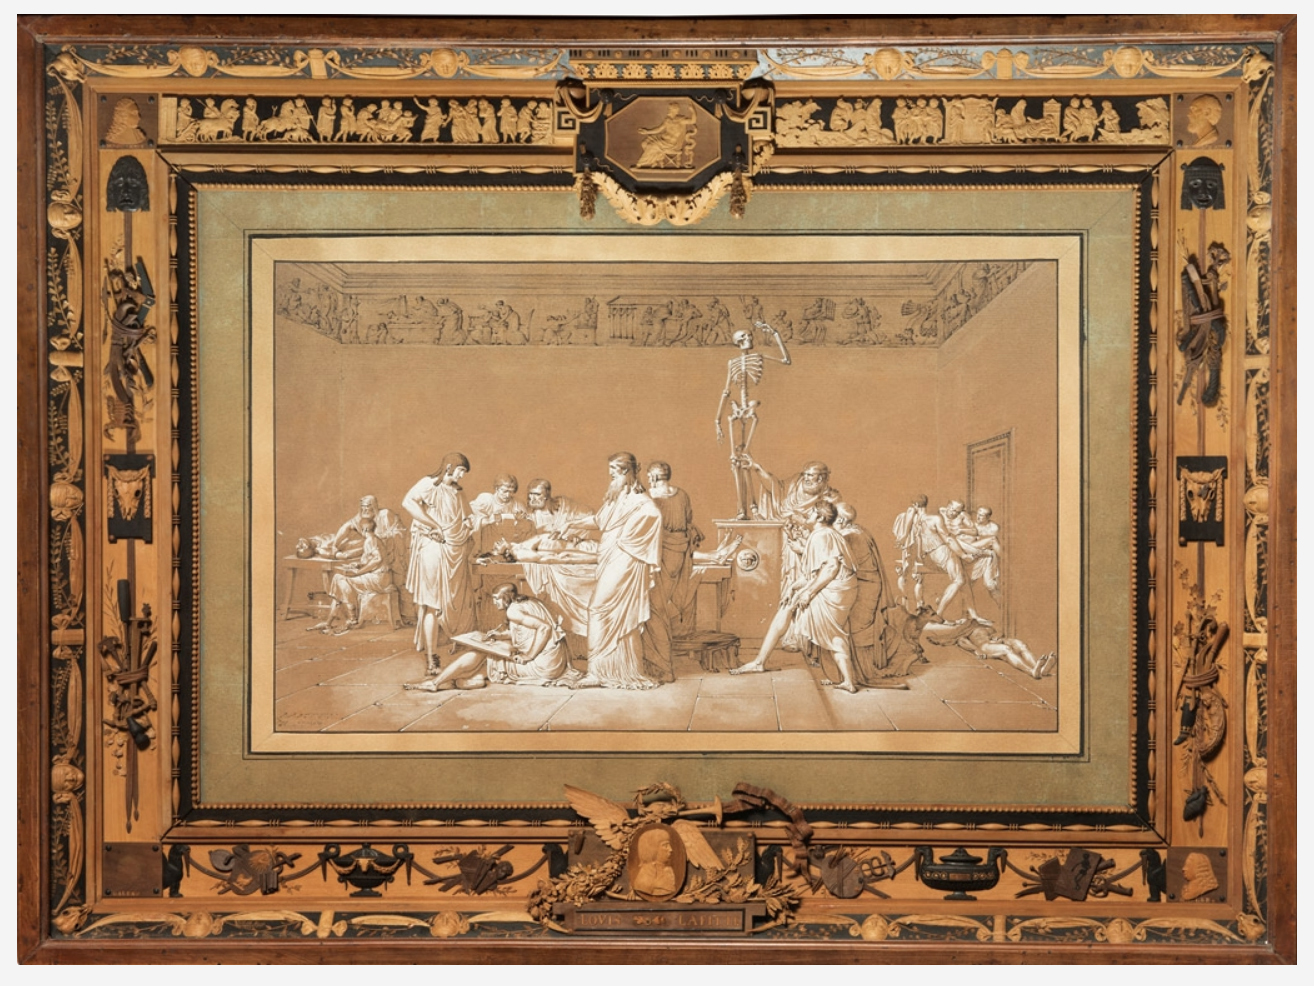 6A Bonzanigo The School of Greek Anatomy 1793 Pinacoteca Accademia Albertina Turin